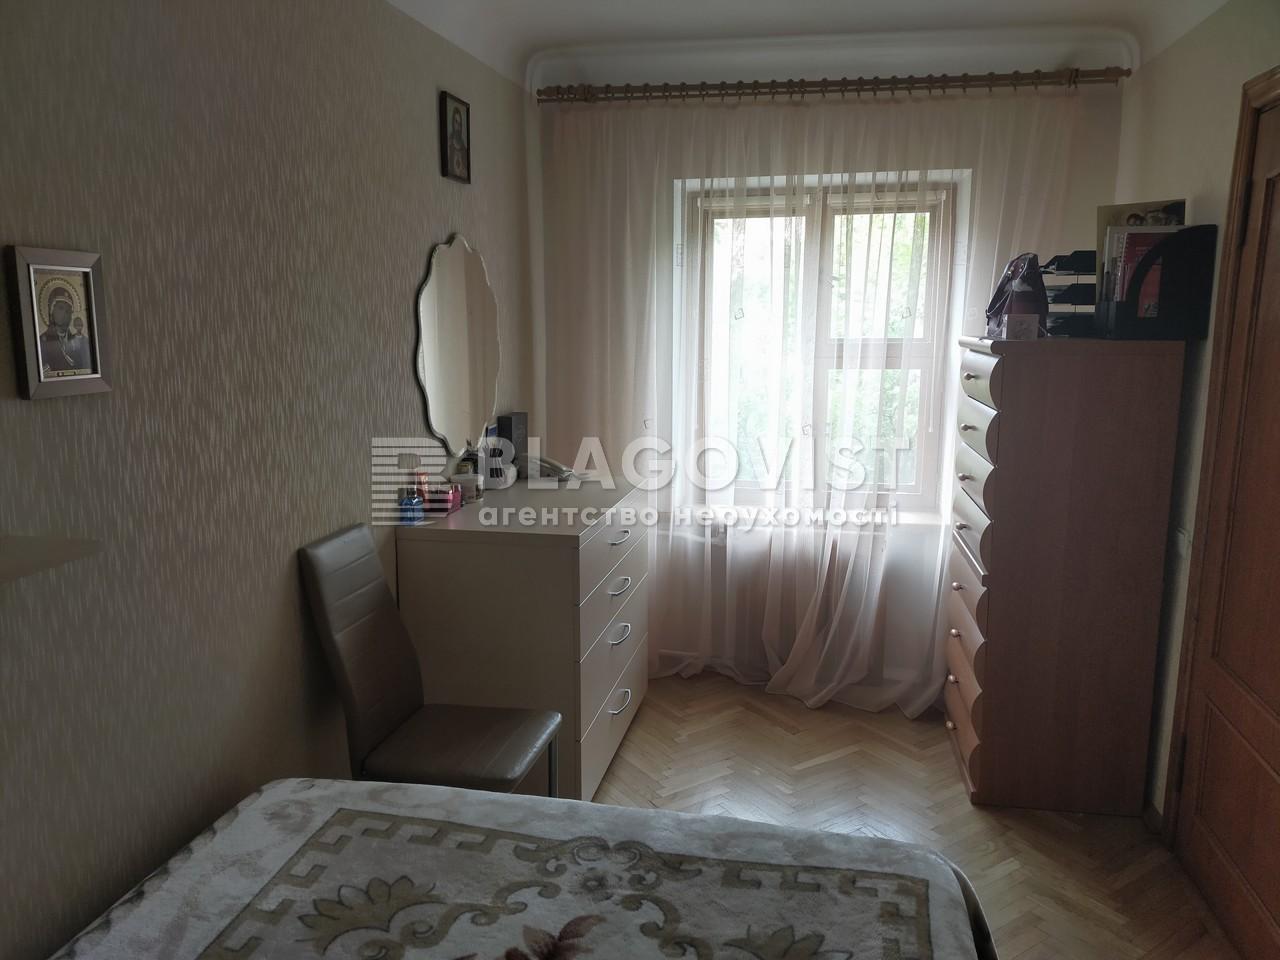 Квартира M-39350, Неманская, 6, Киев - Фото 8